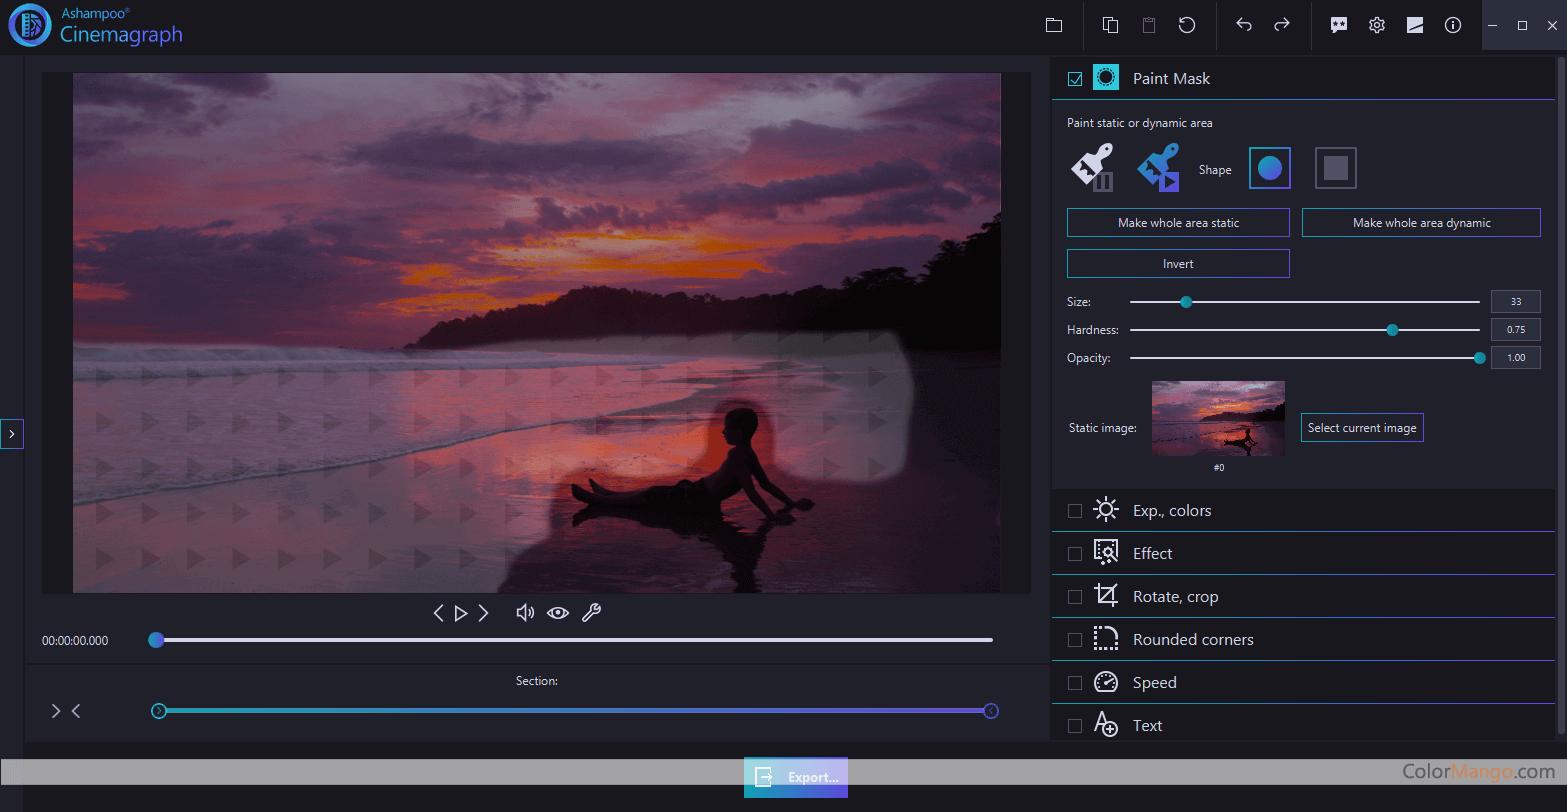 Ashampoo Cinemagraph Screenshot